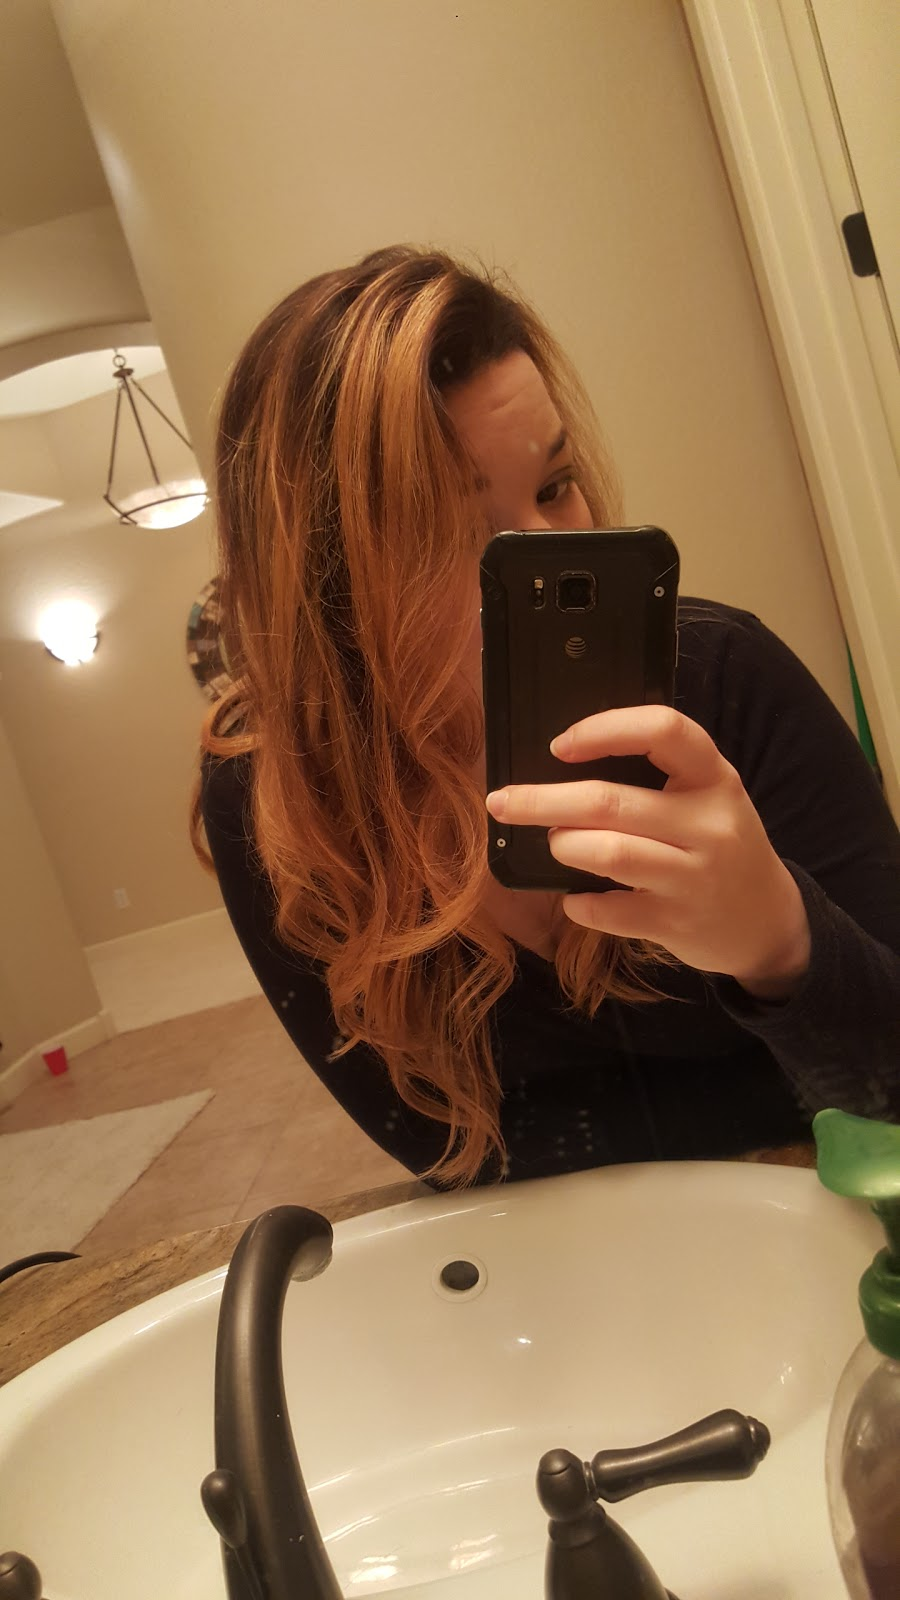 Bloom Salon - hair care    Photo 7 of 10   Address: 18255 N 83rd Ave, Glendale, AZ 85308, USA   Phone: (623) 572-6959